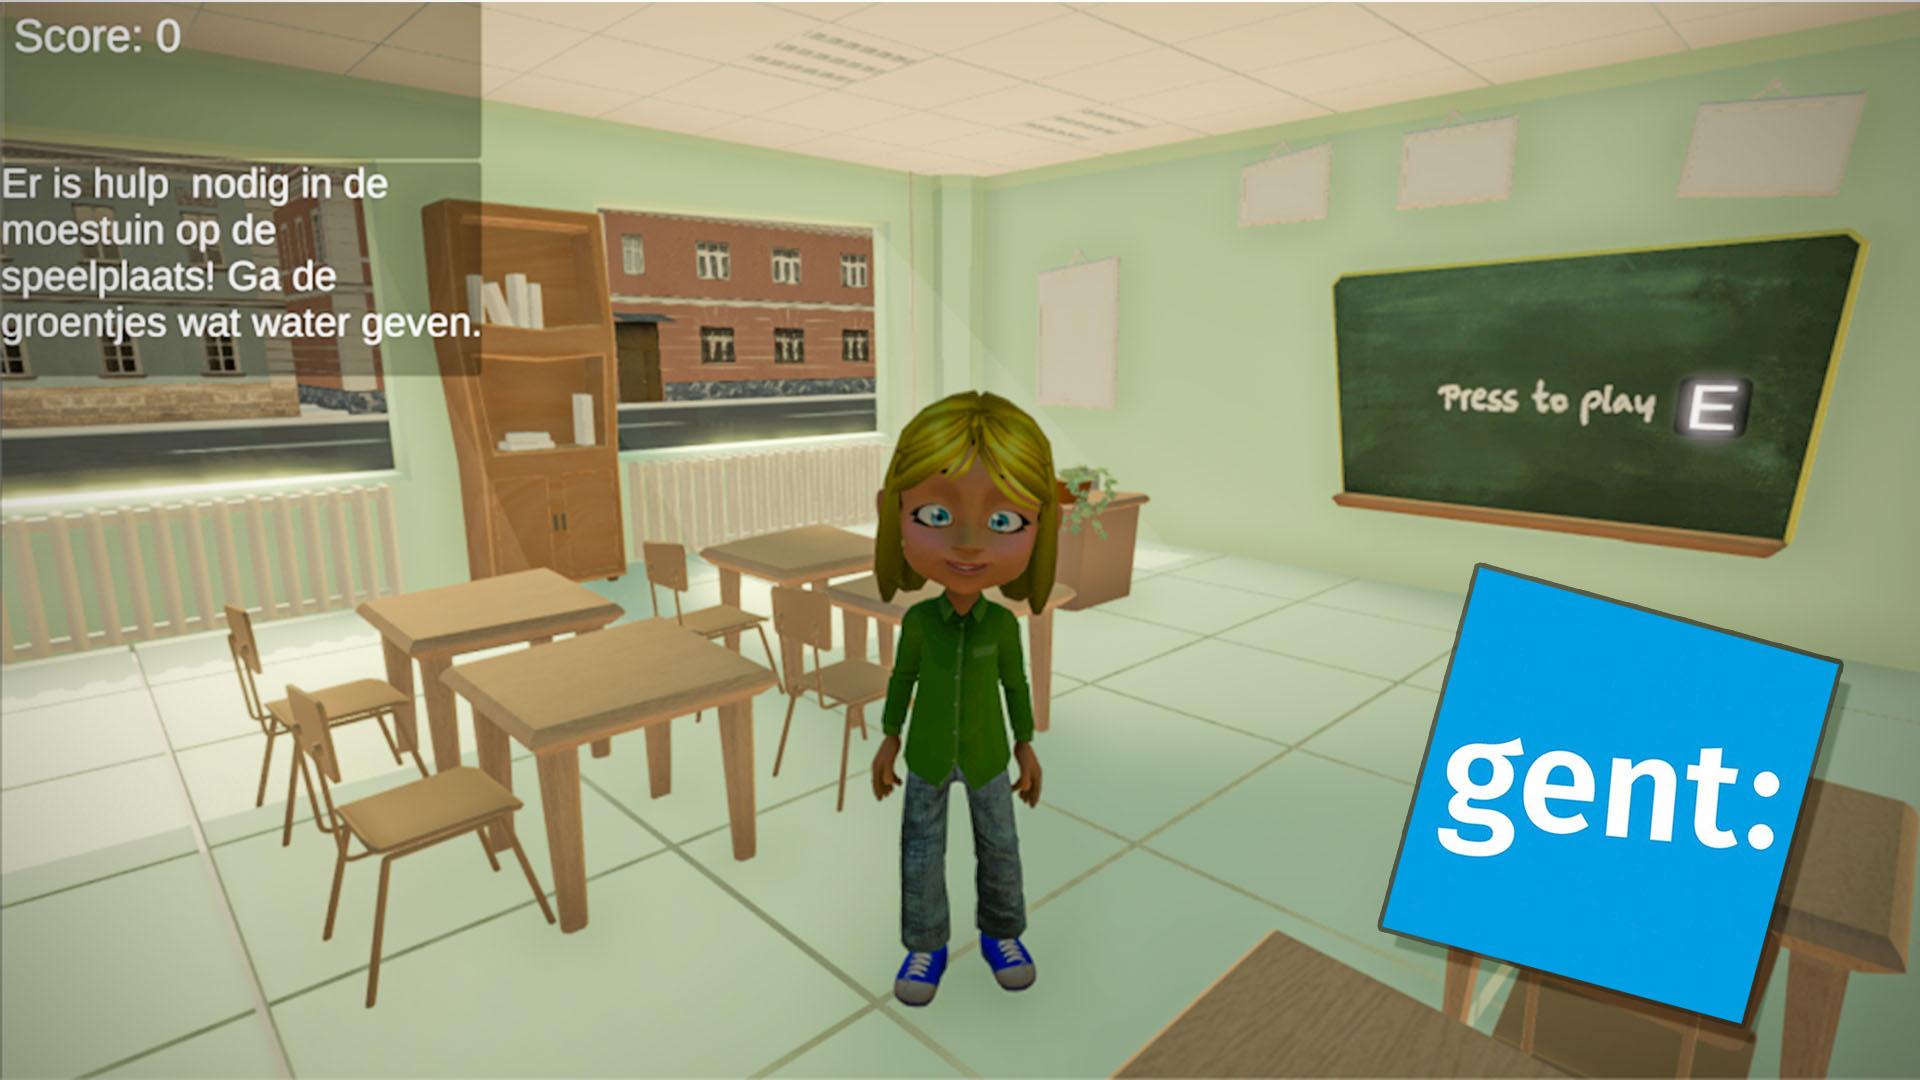 Screenshot enviroment game Gent 1